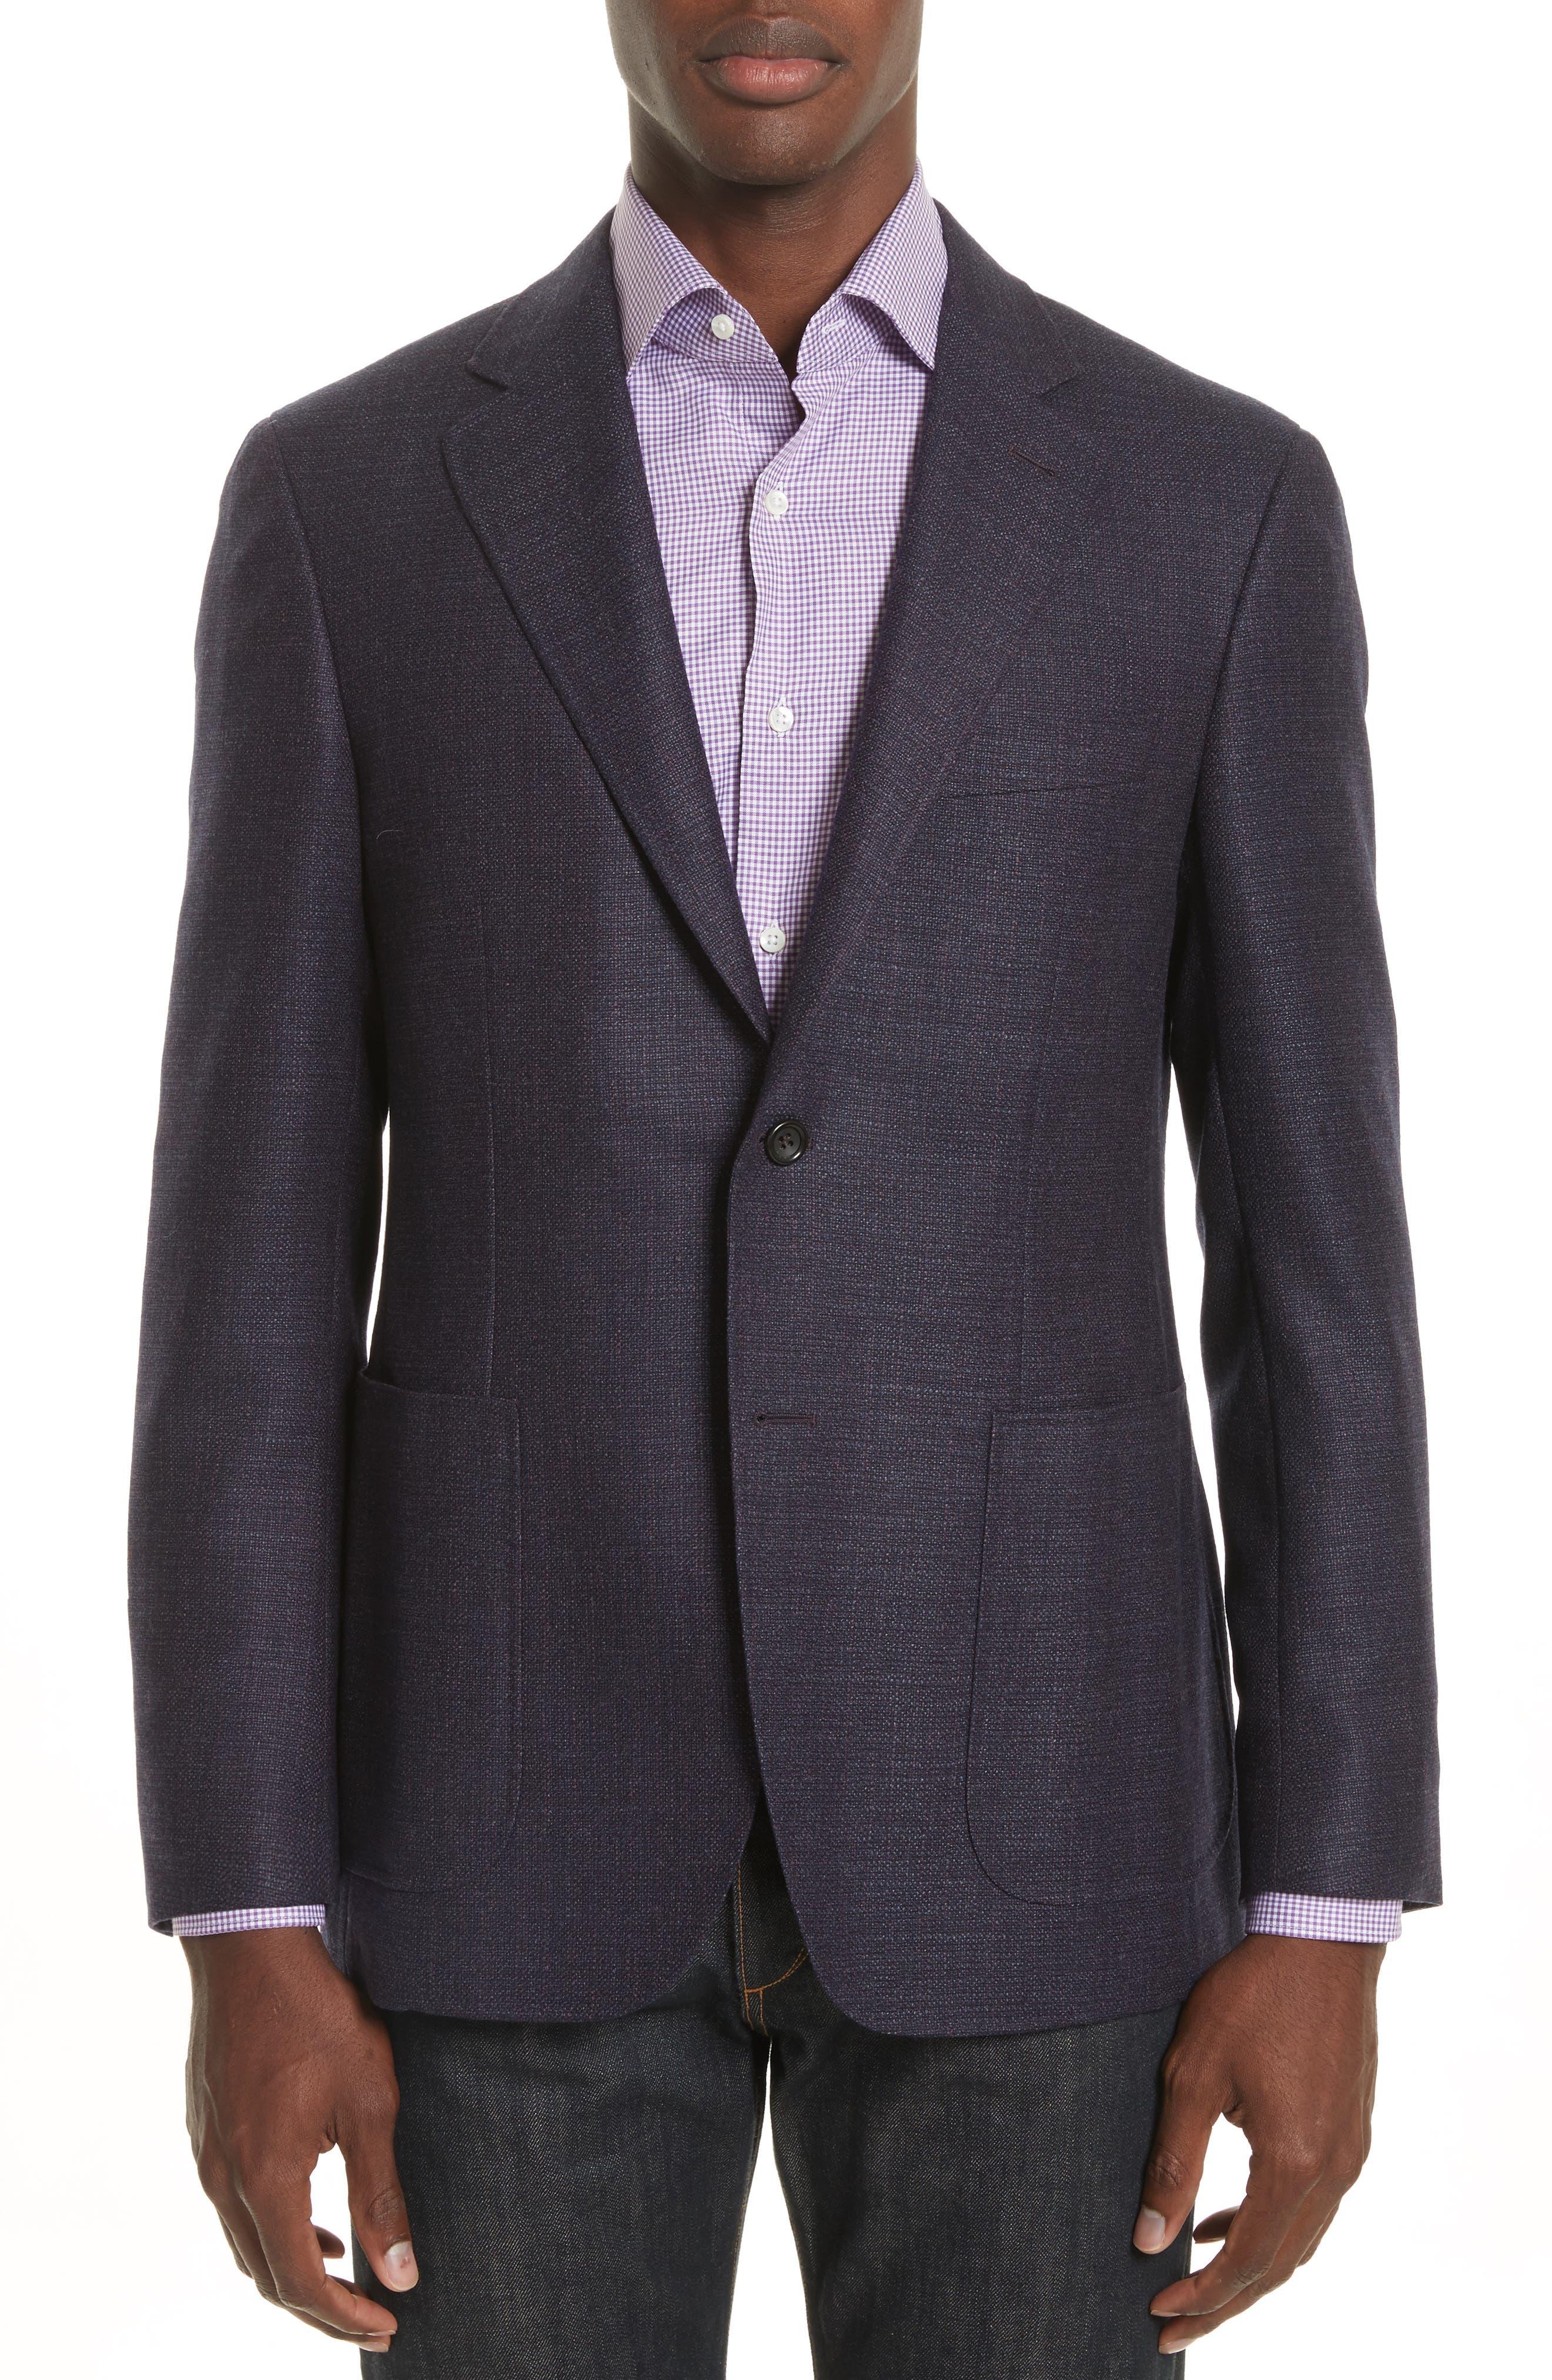 Alternate Image 1 Selected - Canali Kei Coat Classic Fit Wool Blazer